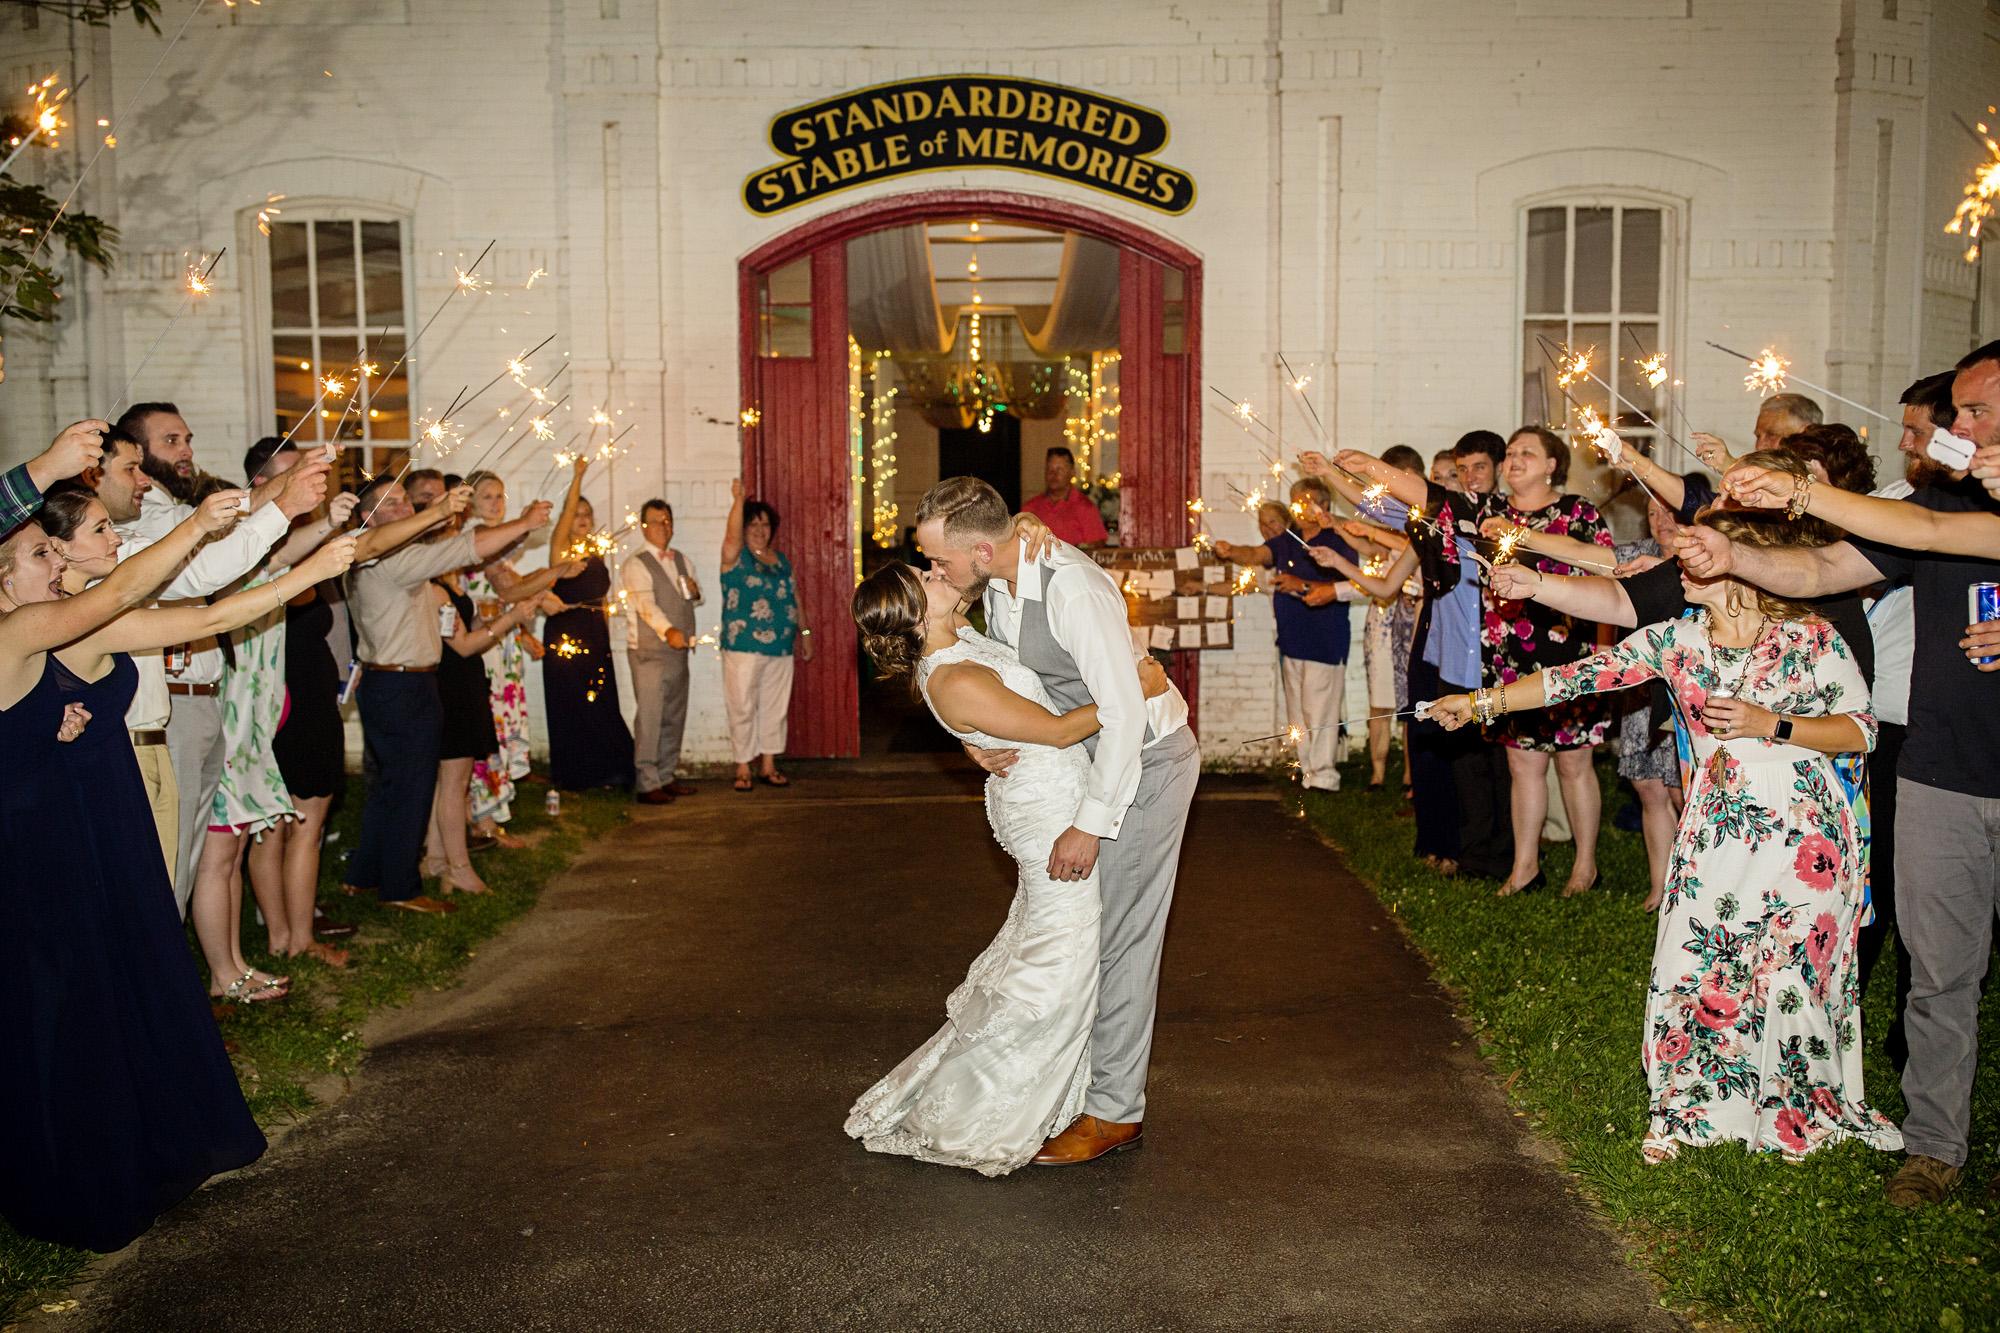 Seriously_Sabrina_Photography_Lexington_Kentucky_Round_Barn_Red_Mile_Stable_of_Memories_Wedding_Hart_143.jpg